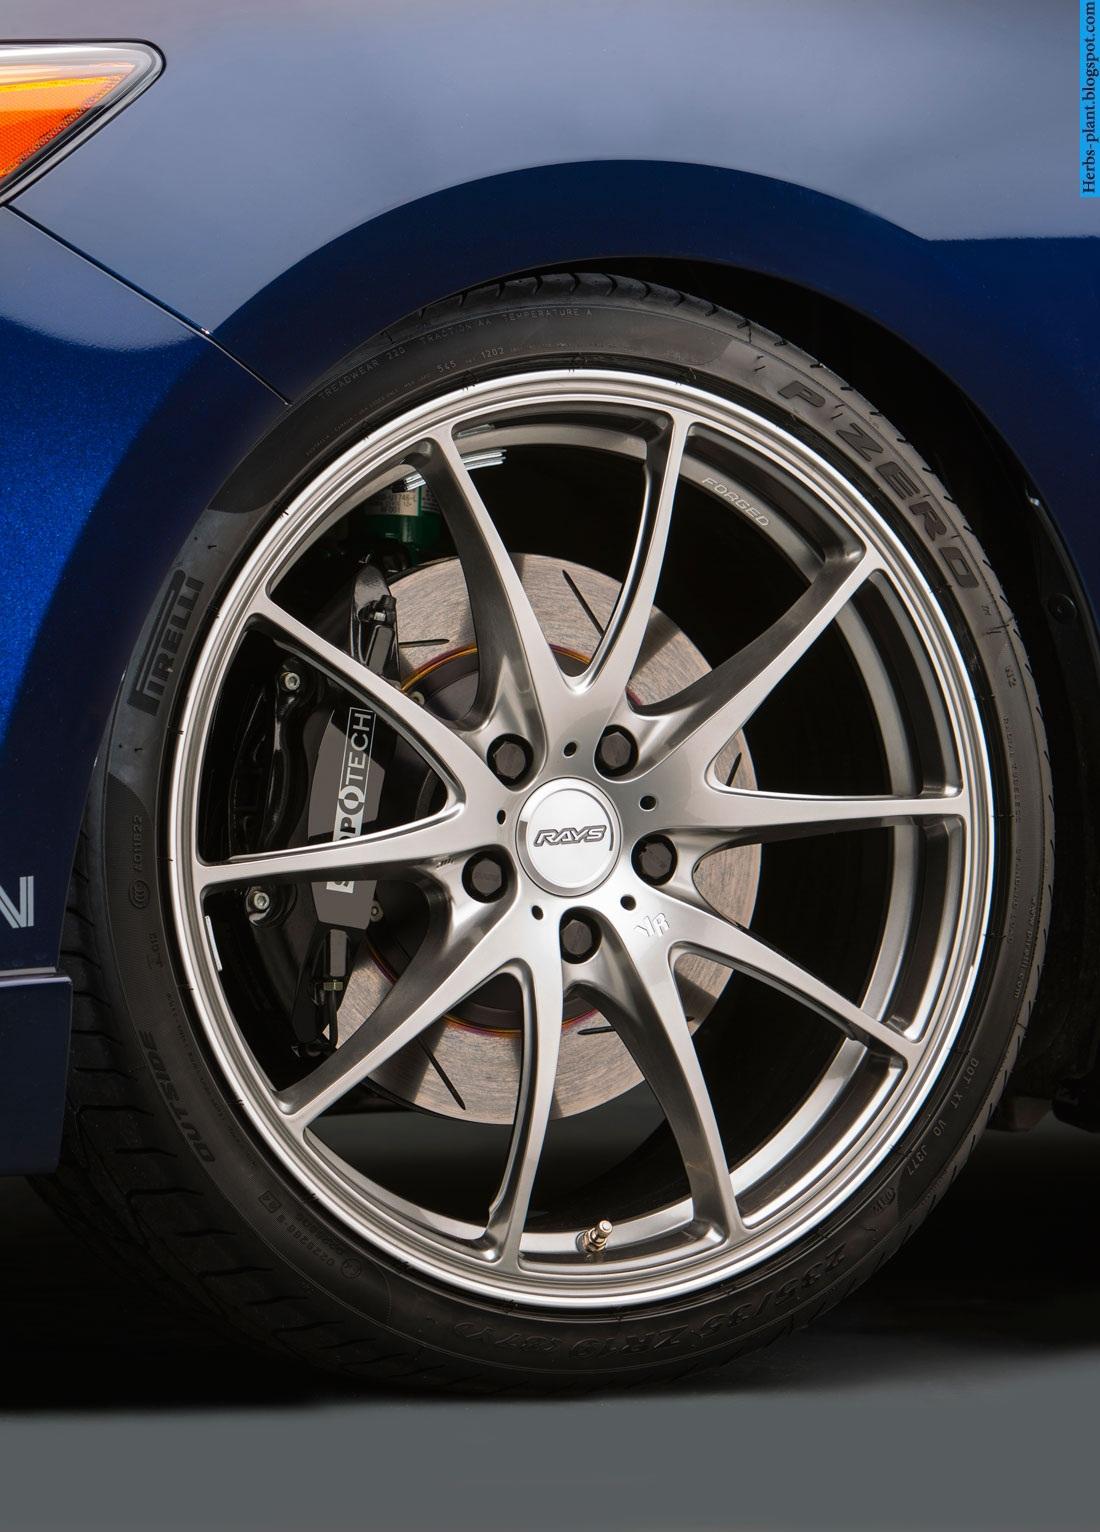 Acura ilx car 2013 tyres/wheels - صور اطارات سيارة اكورا اي ال اكس 2013